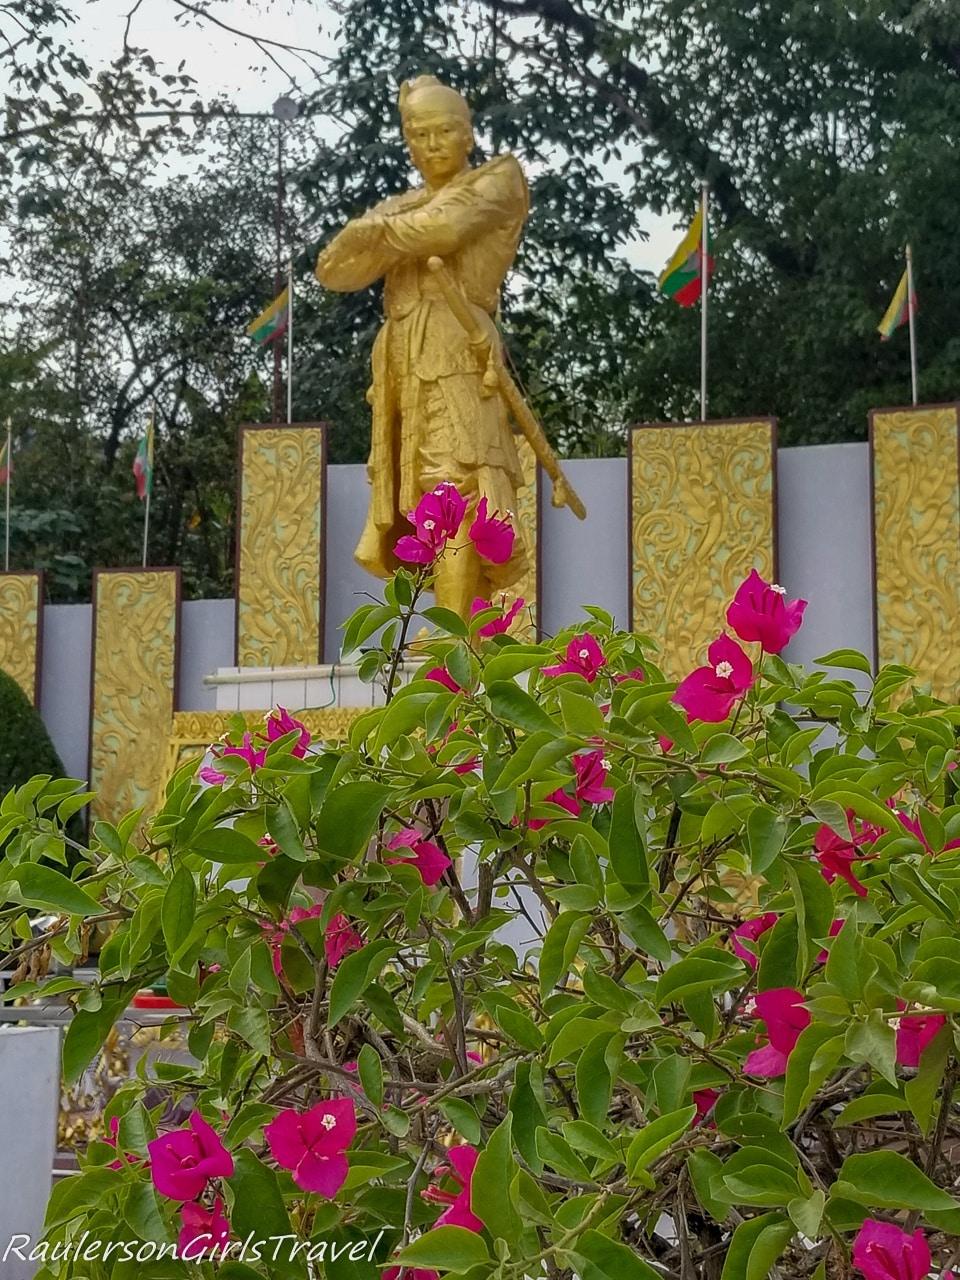 Golden Burmese King Statue